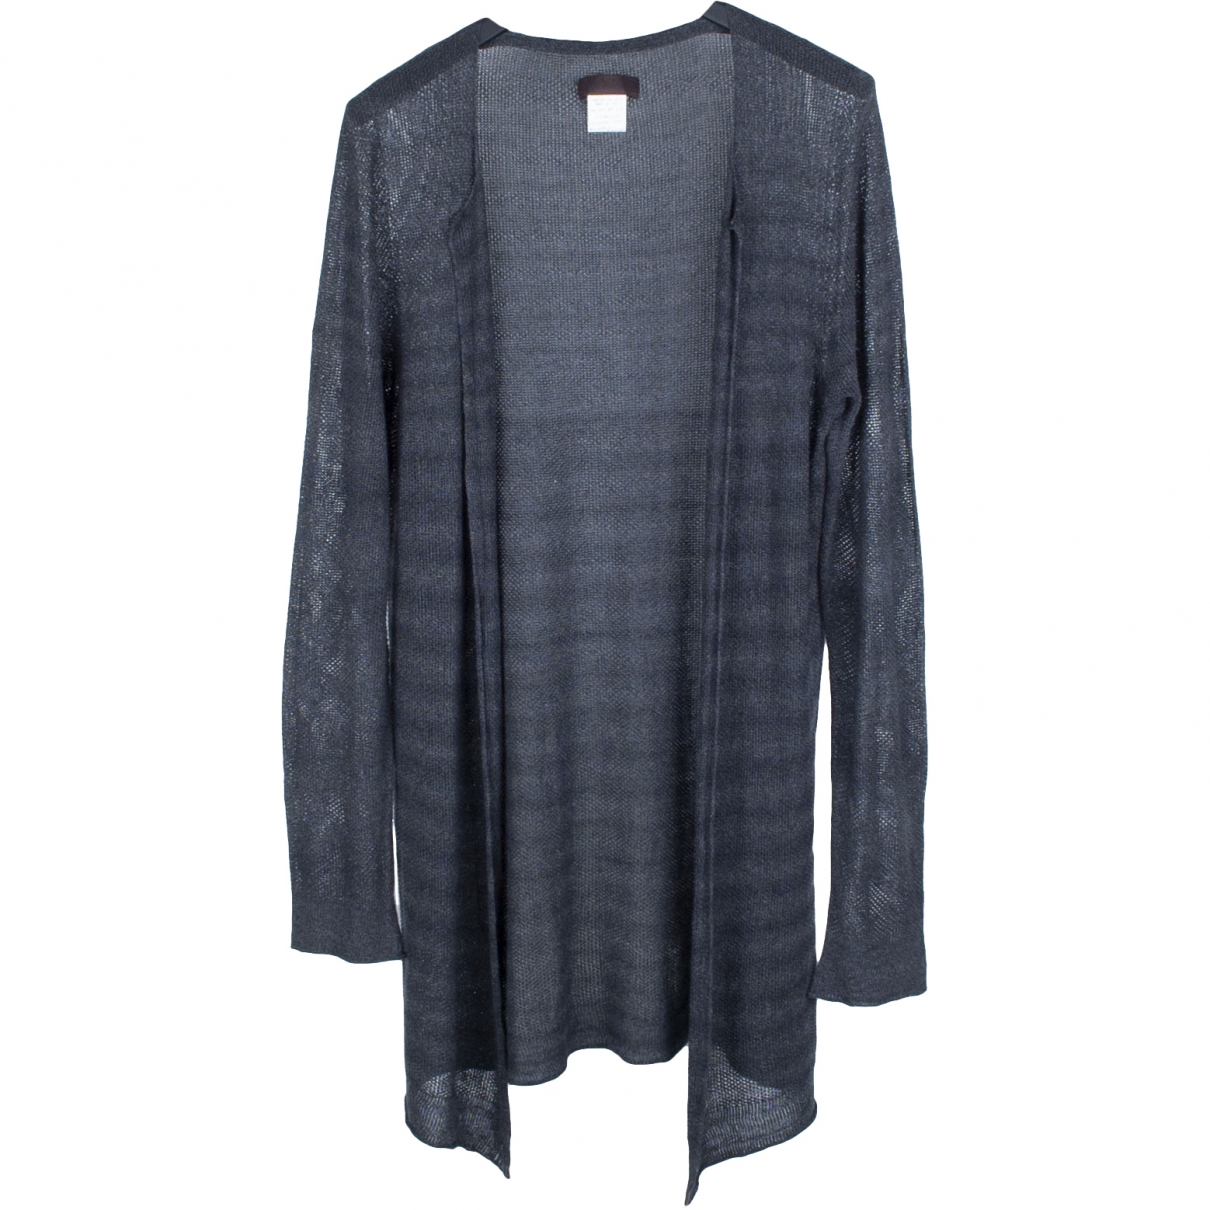 Yohji Yamamoto - Pulls.Gilets.Sweats   pour homme en coton - noir